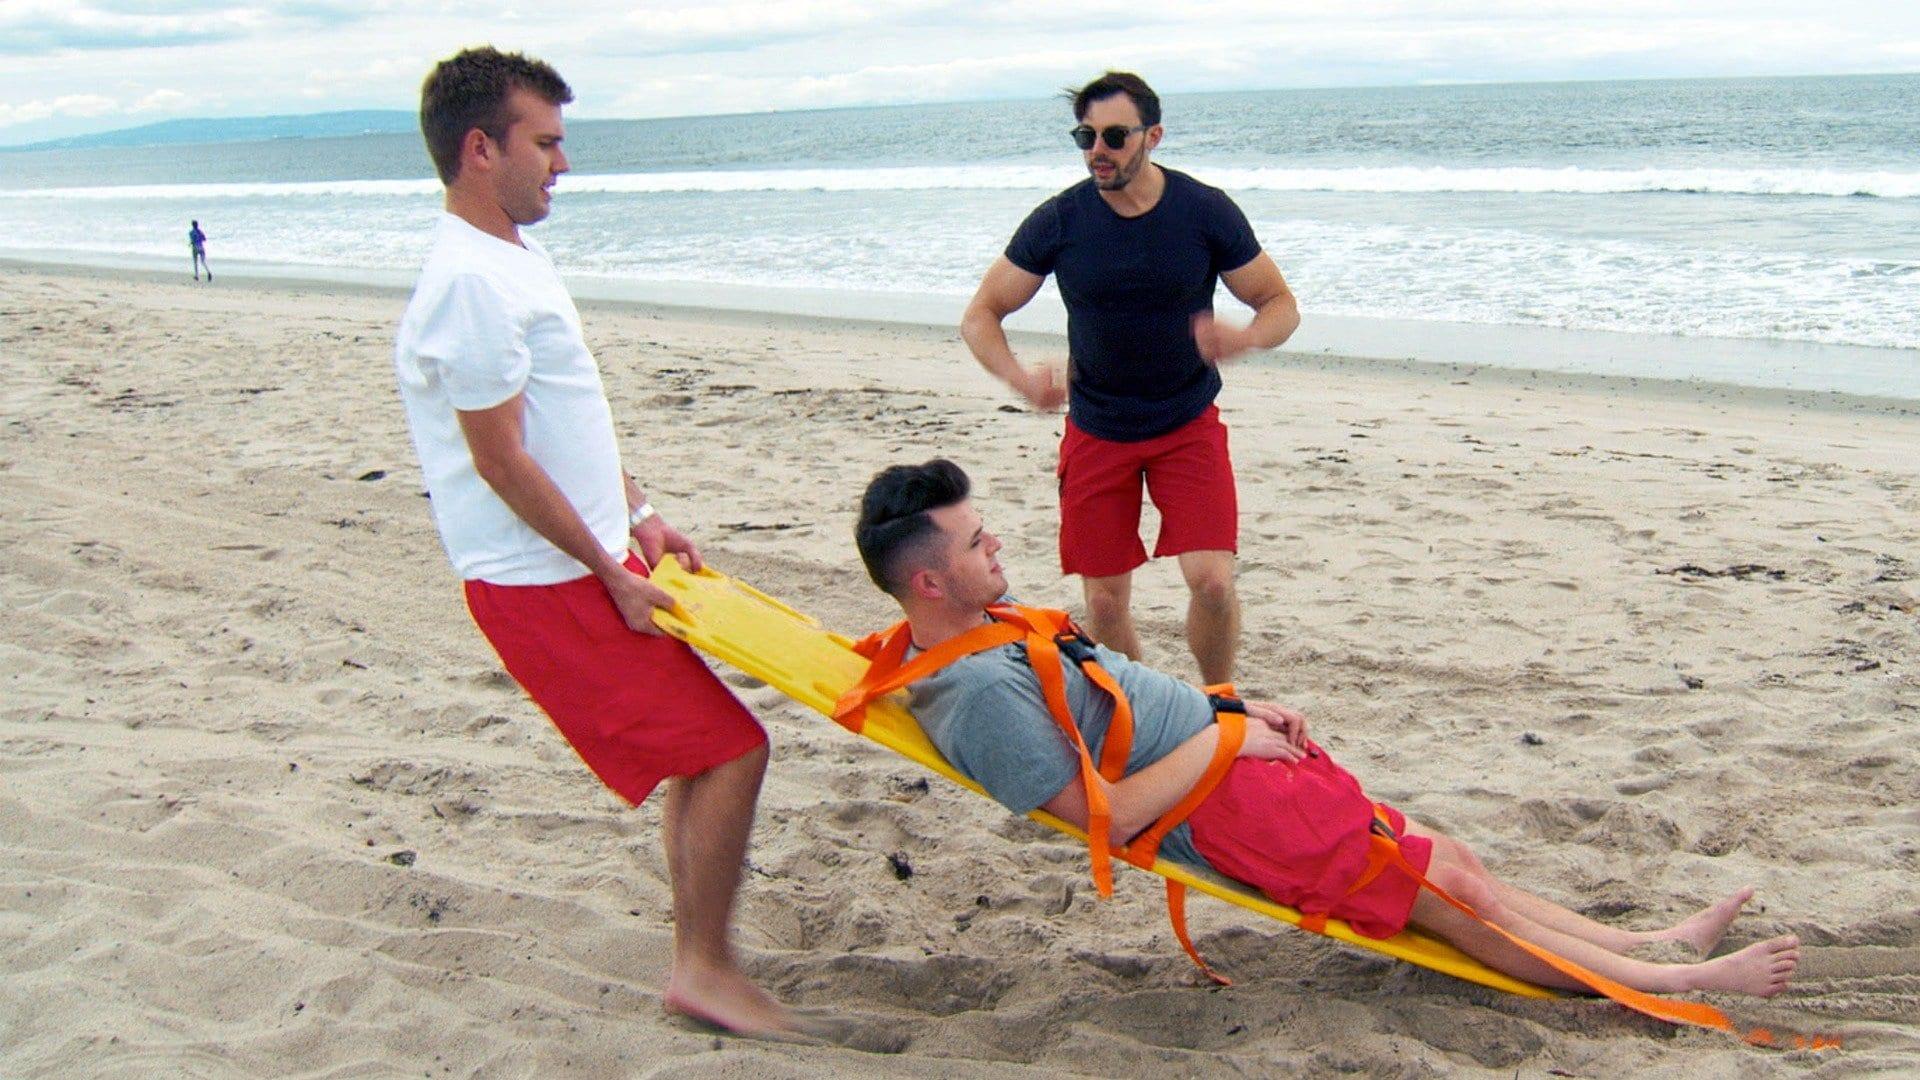 Lifeguarding for Dummies